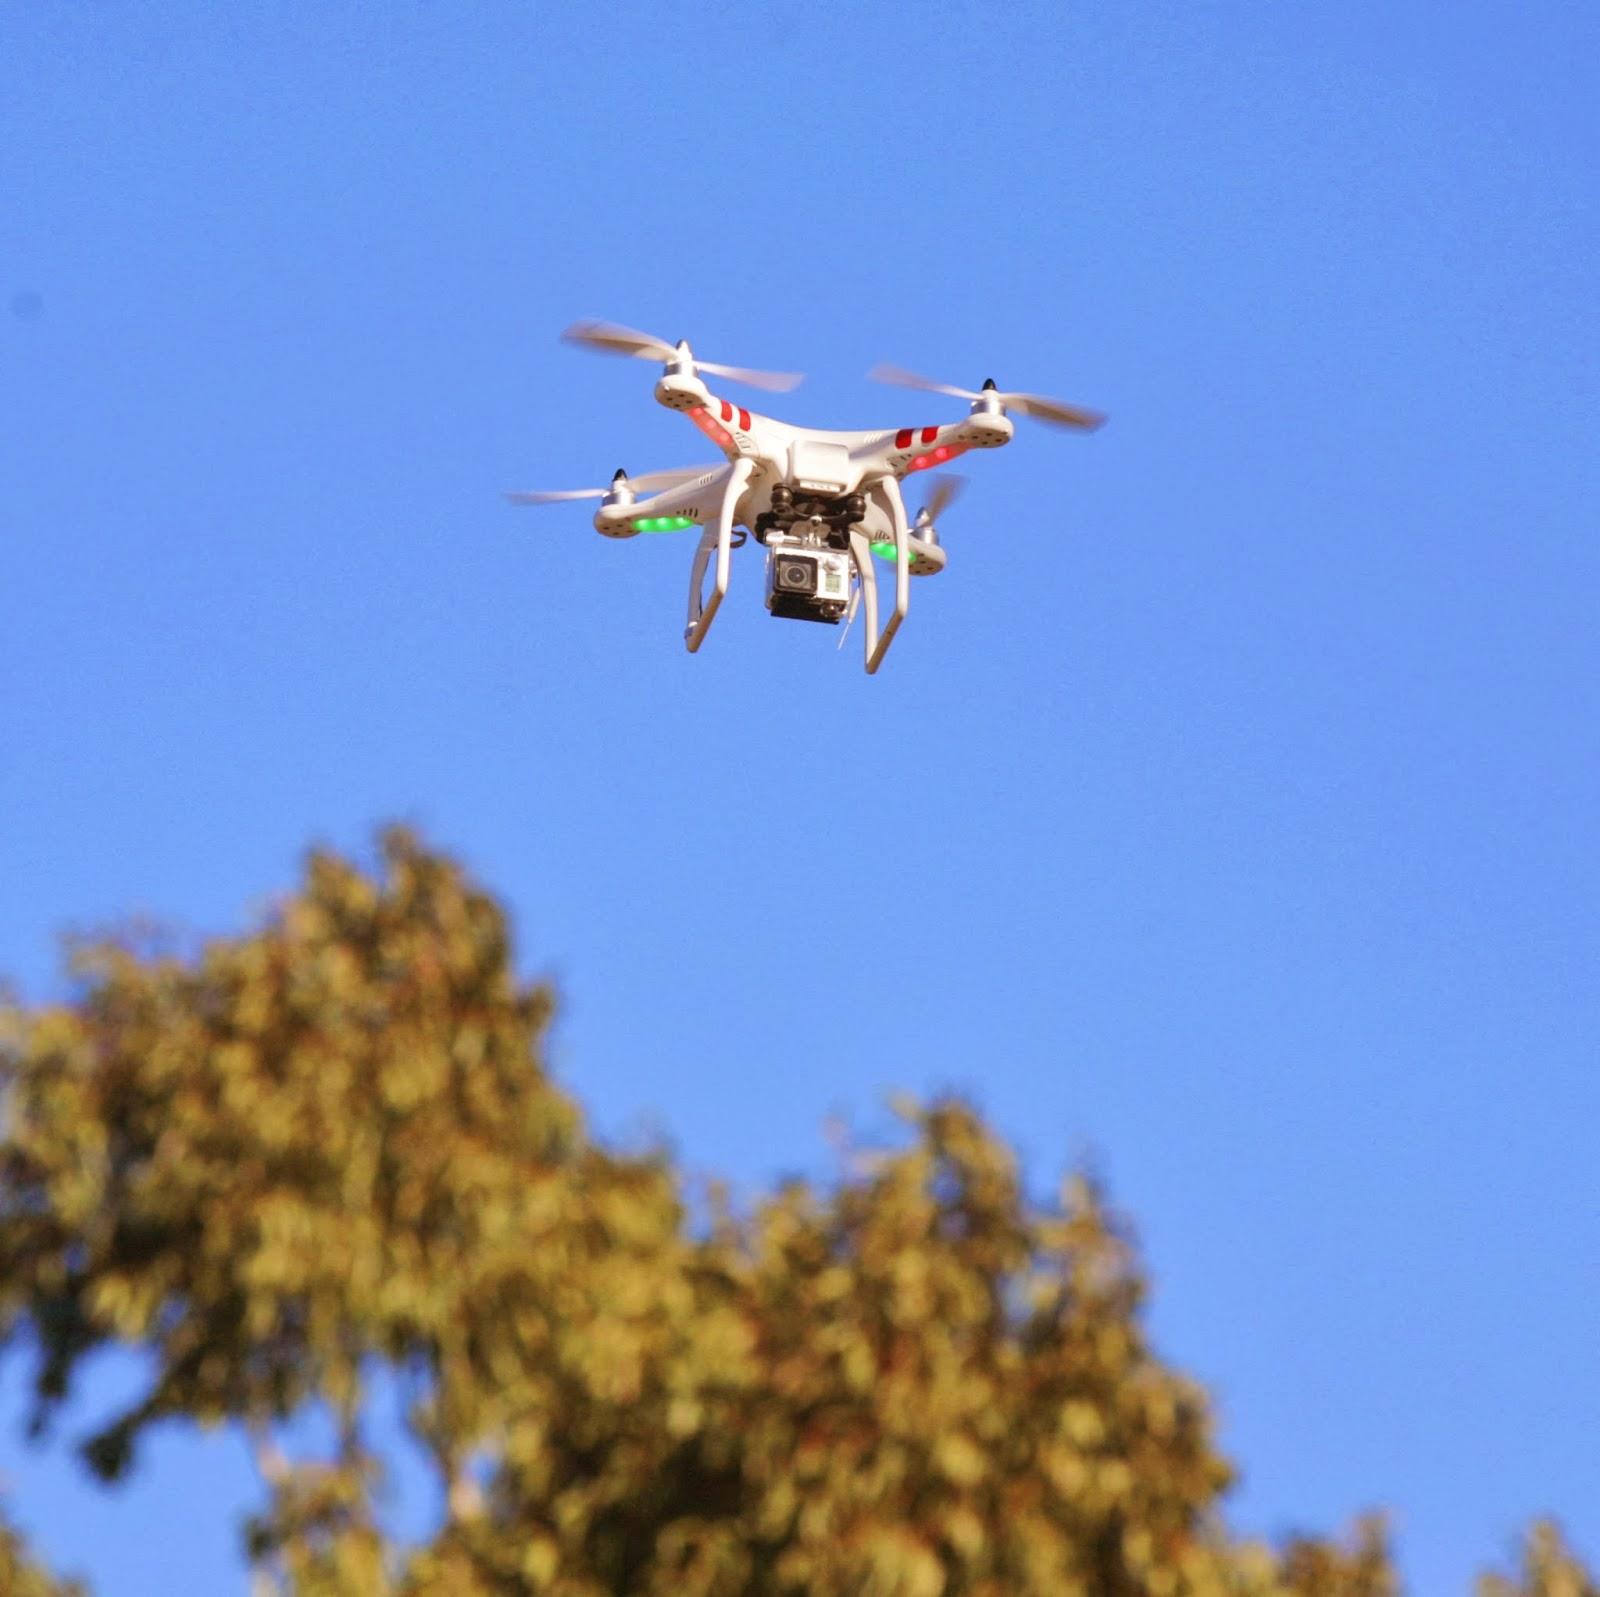 drones13.jpg